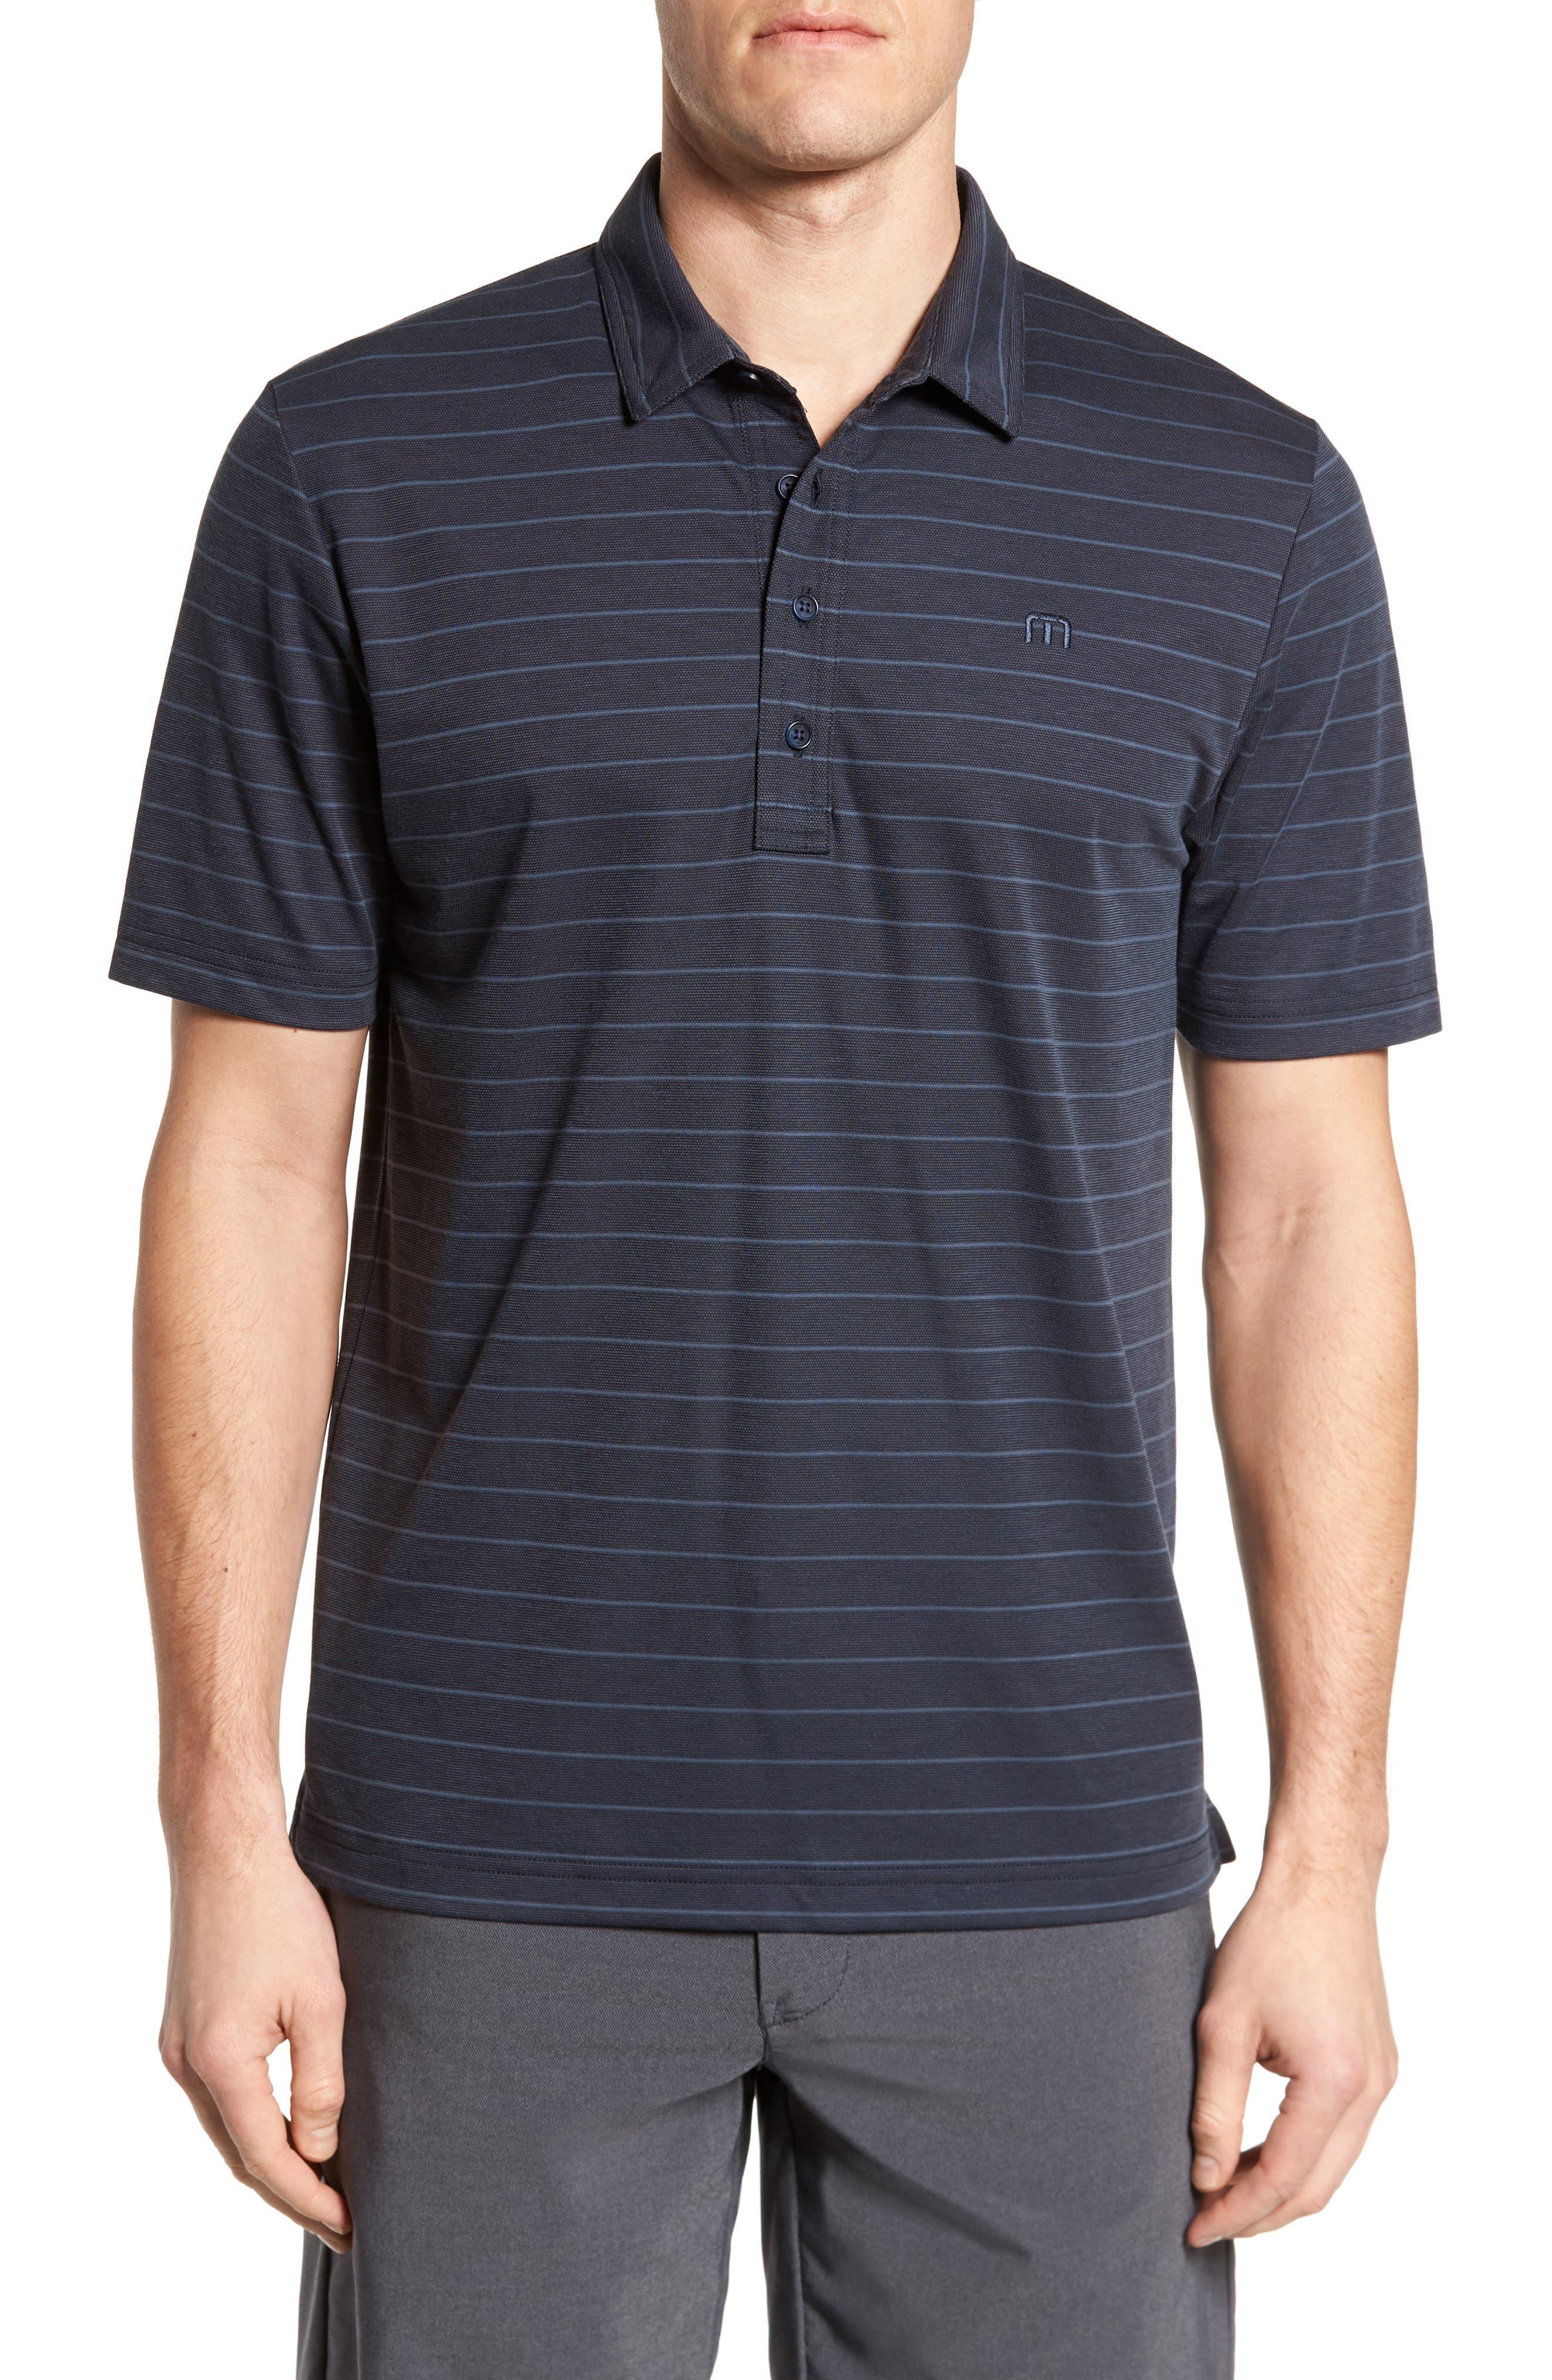 Marini Polo Shirt,                             Main thumbnail 1, color,                             BLUE NIGHTS/ ALLURE